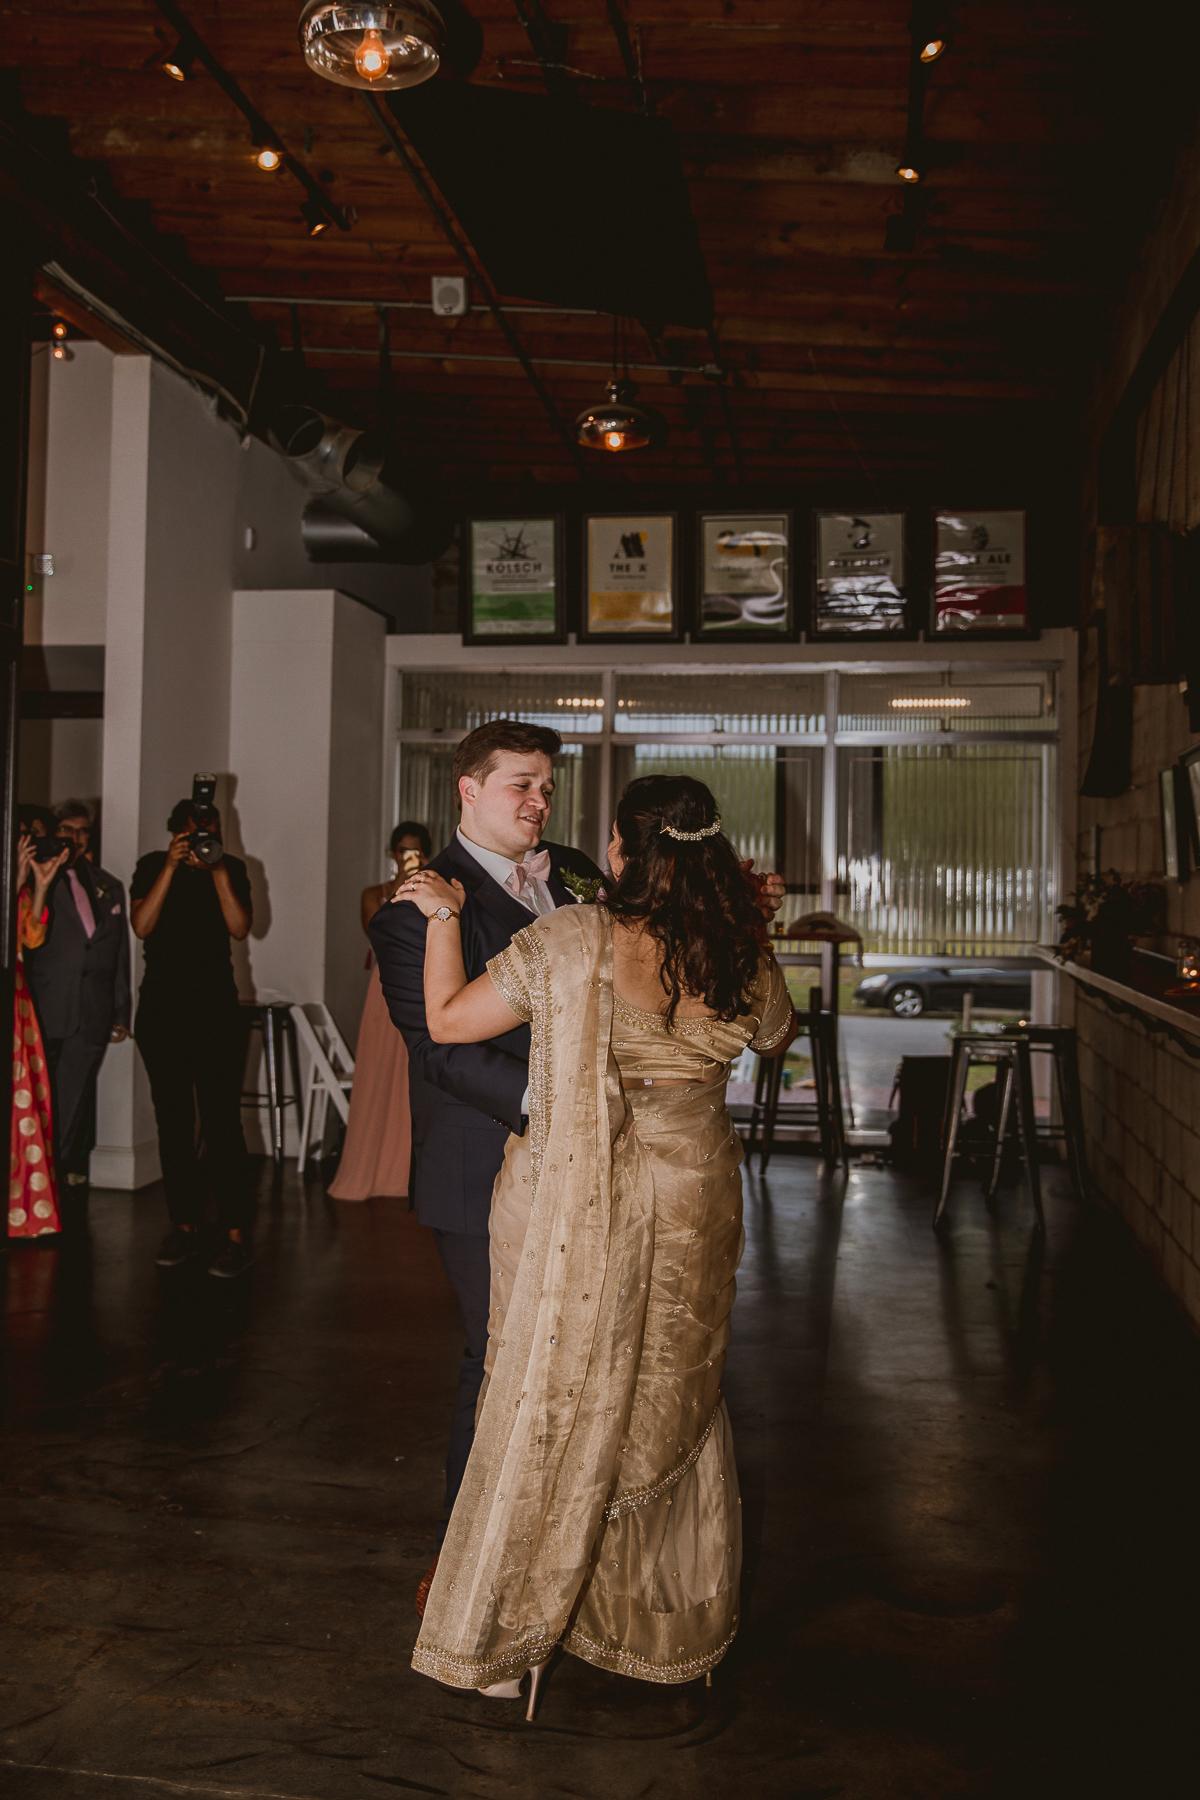 eventide-brewery-indian-american-fusion-kelley-raye-atlanta-los-angeles-wedding-photographer-105.jpg